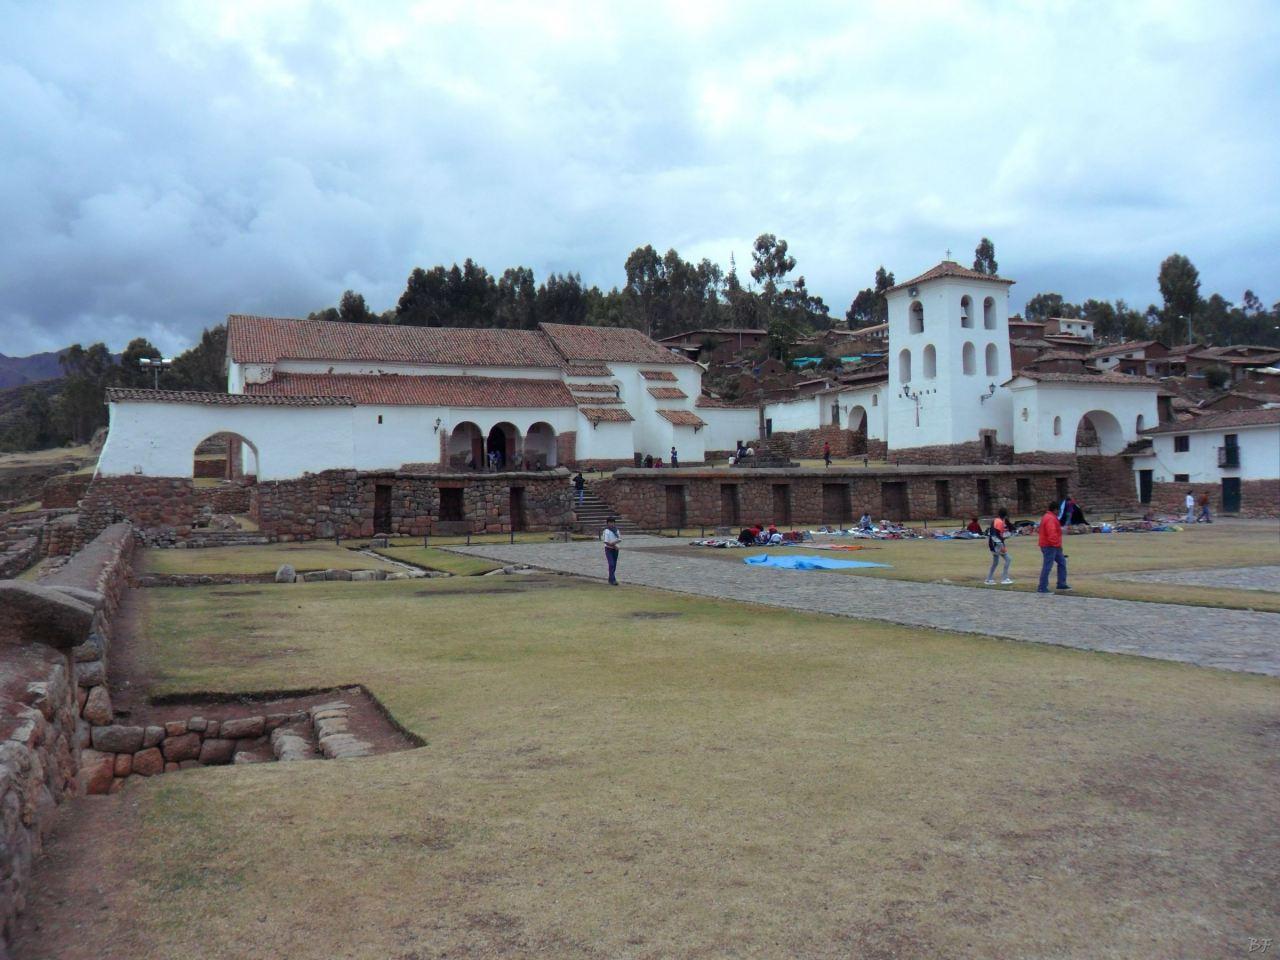 Chinchero-Mura-Poligonali-Piramide-Urubamba-Peru-7